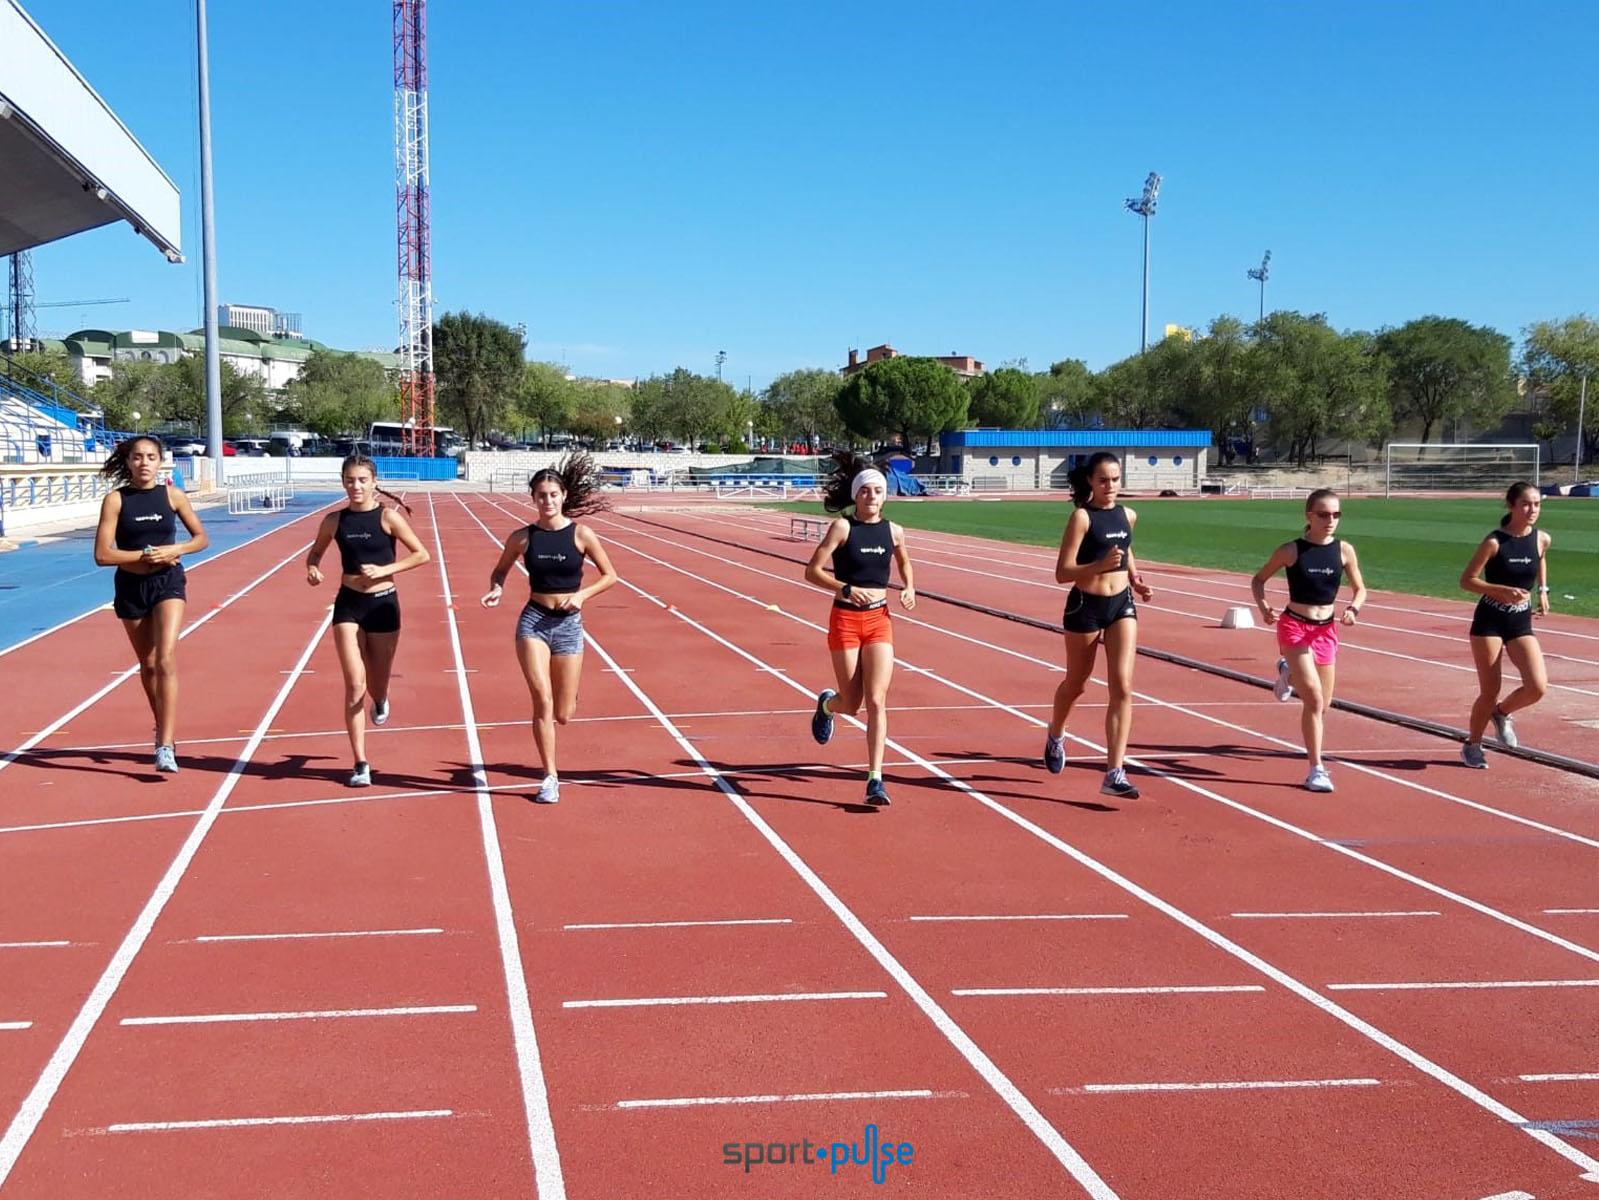 Sport·Pulse pasa RCD al PROTAMA